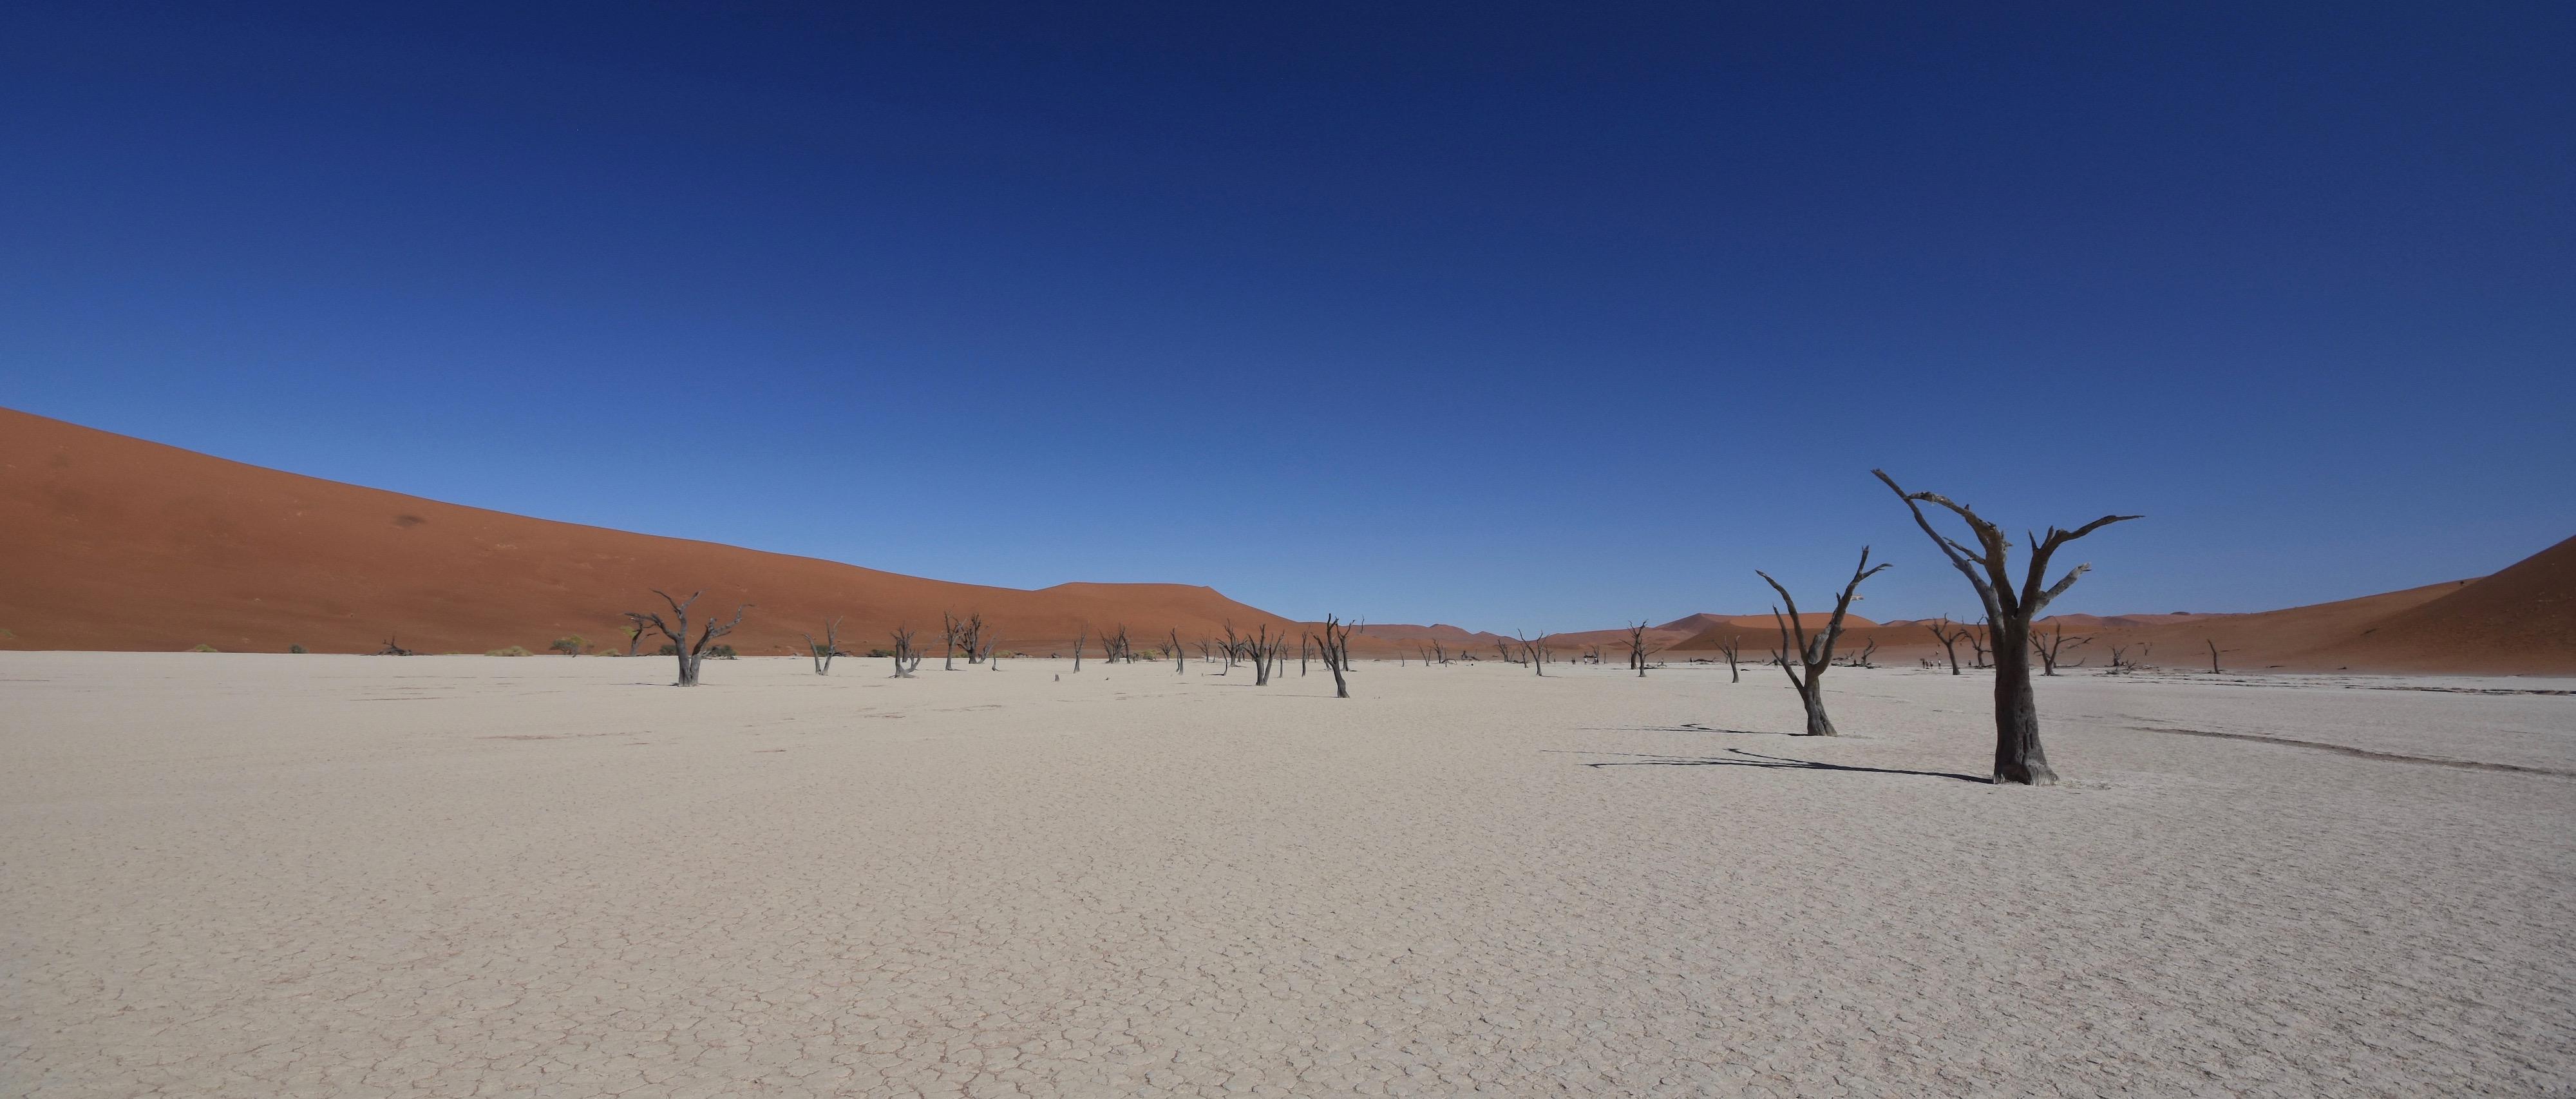 Exlporing Namibia - Deadvlei